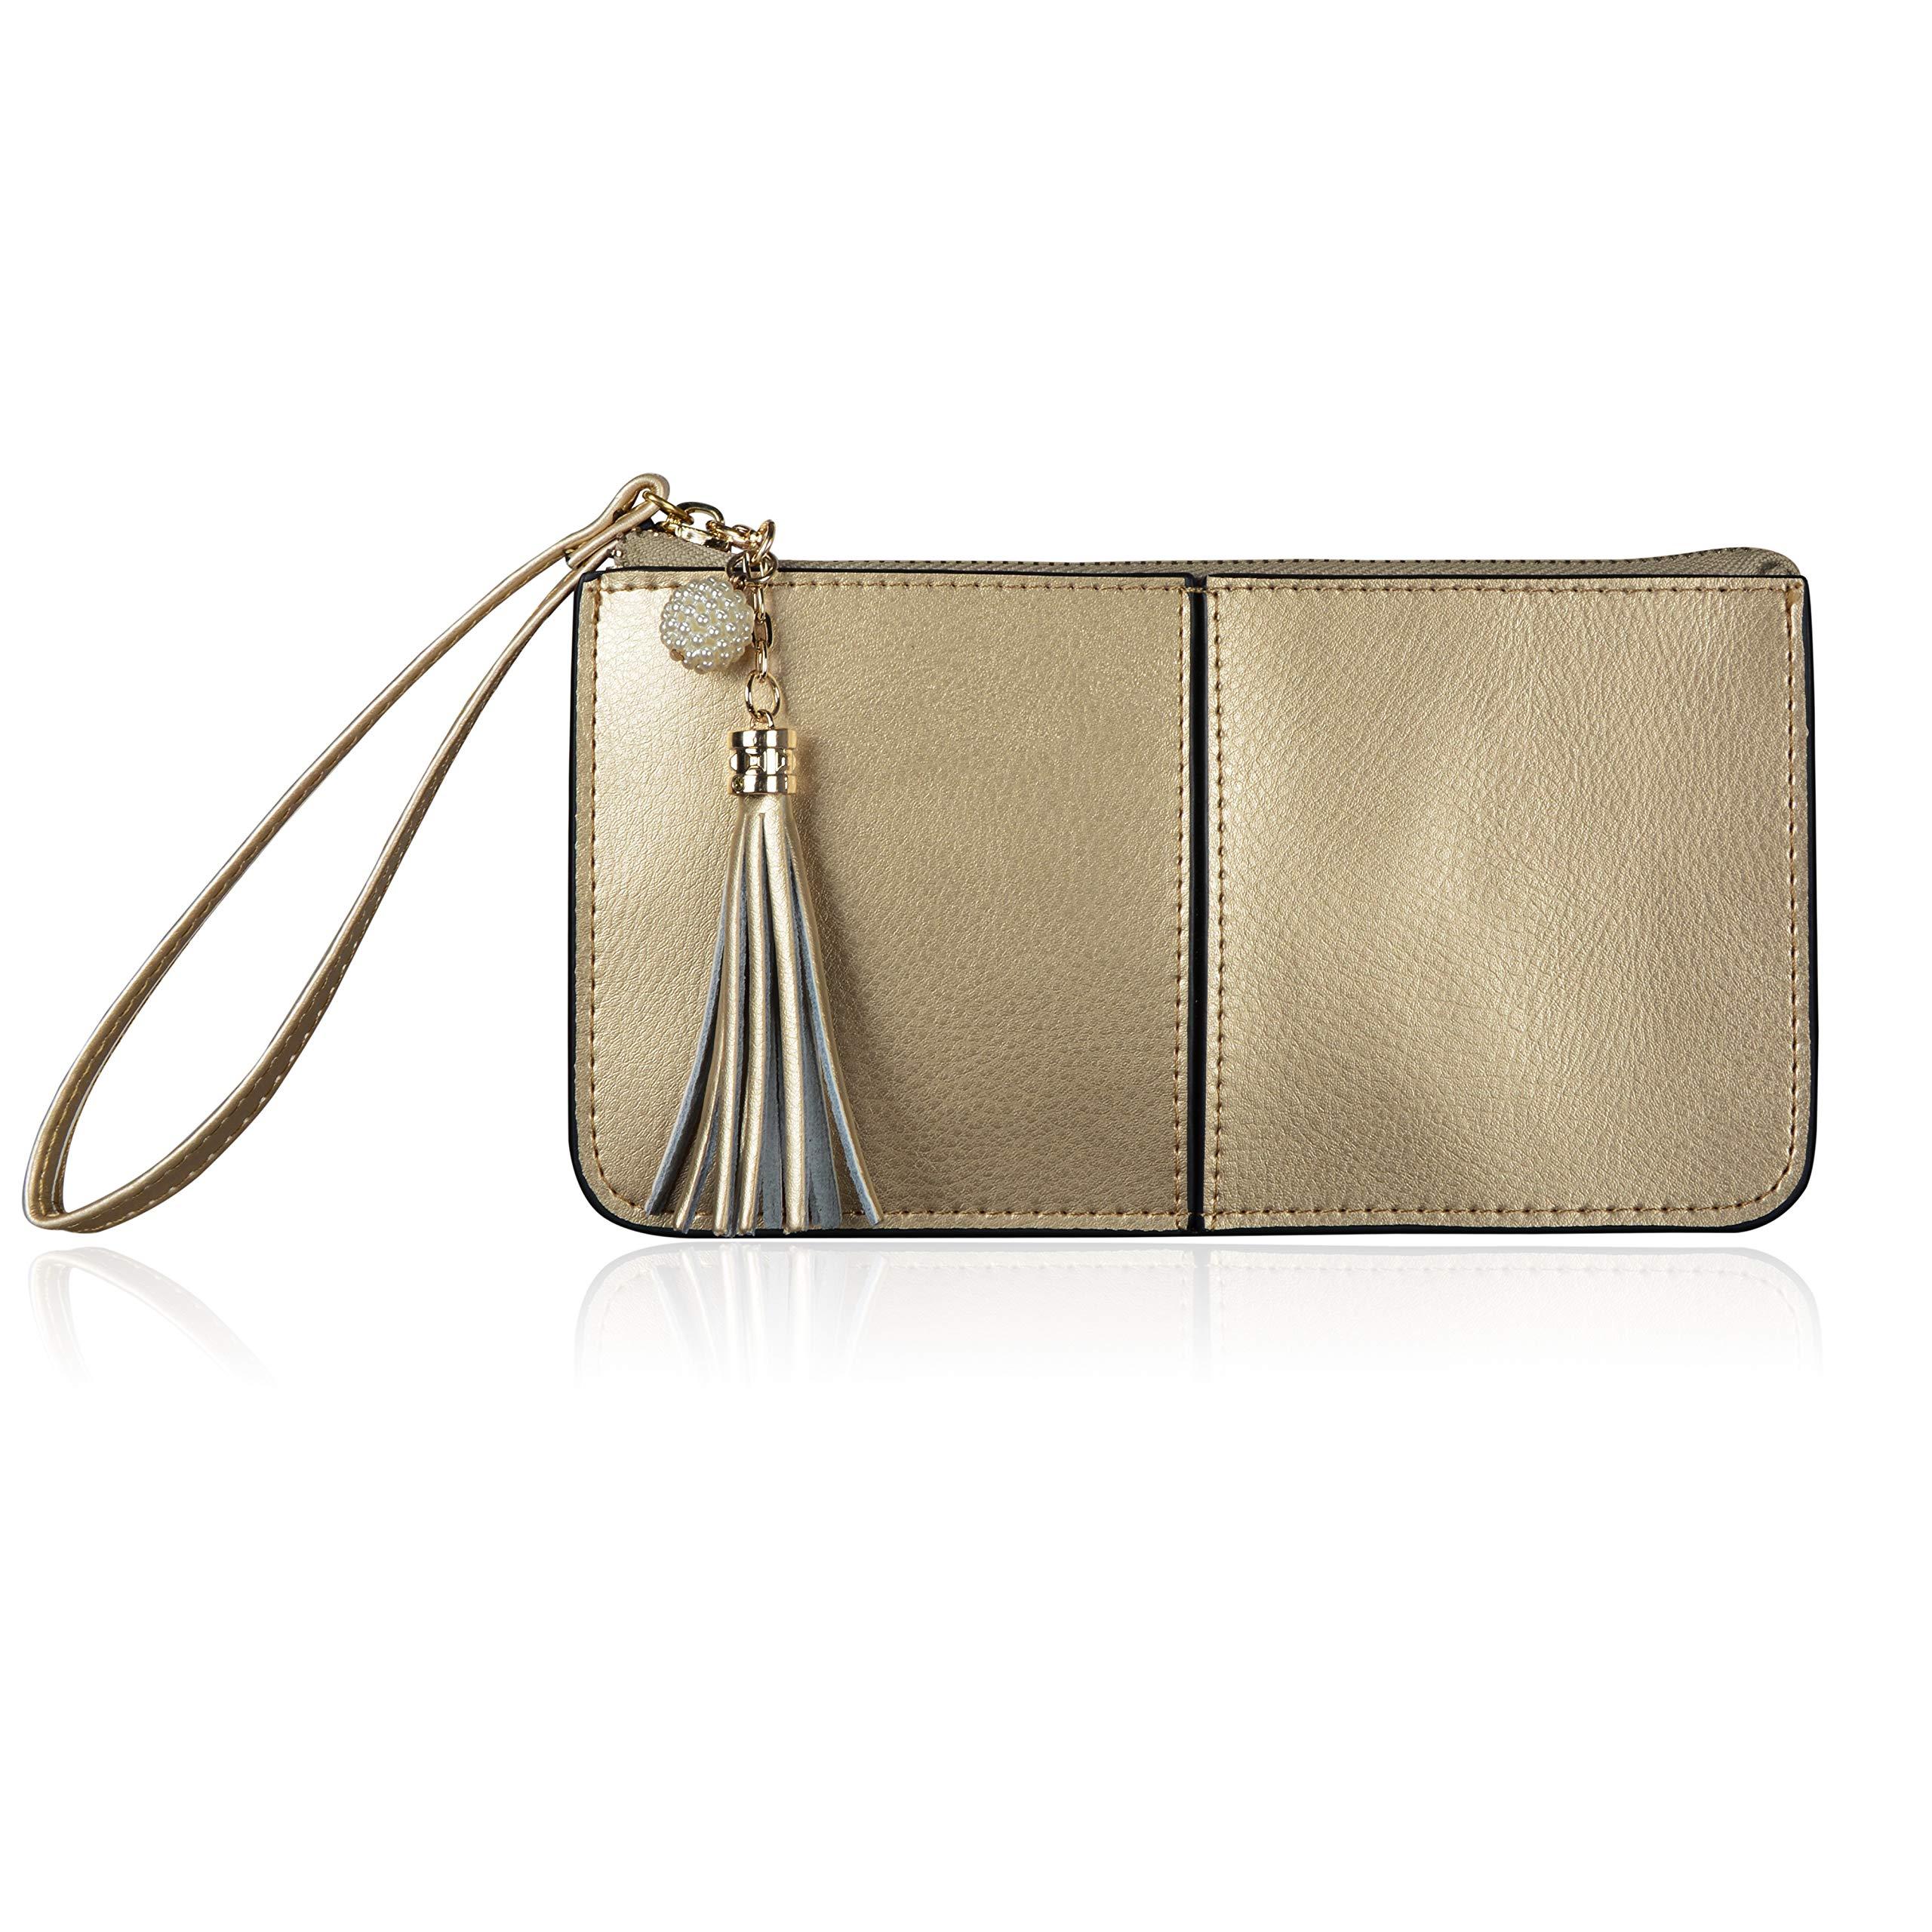 Befen Soft Leather Wristlet Phone Wristlet Wallet Clutch with Wrist Strap/Card slots/Cash pocket- Fit iPhone 6S Plus/Samsung Note 5 – Light Gold